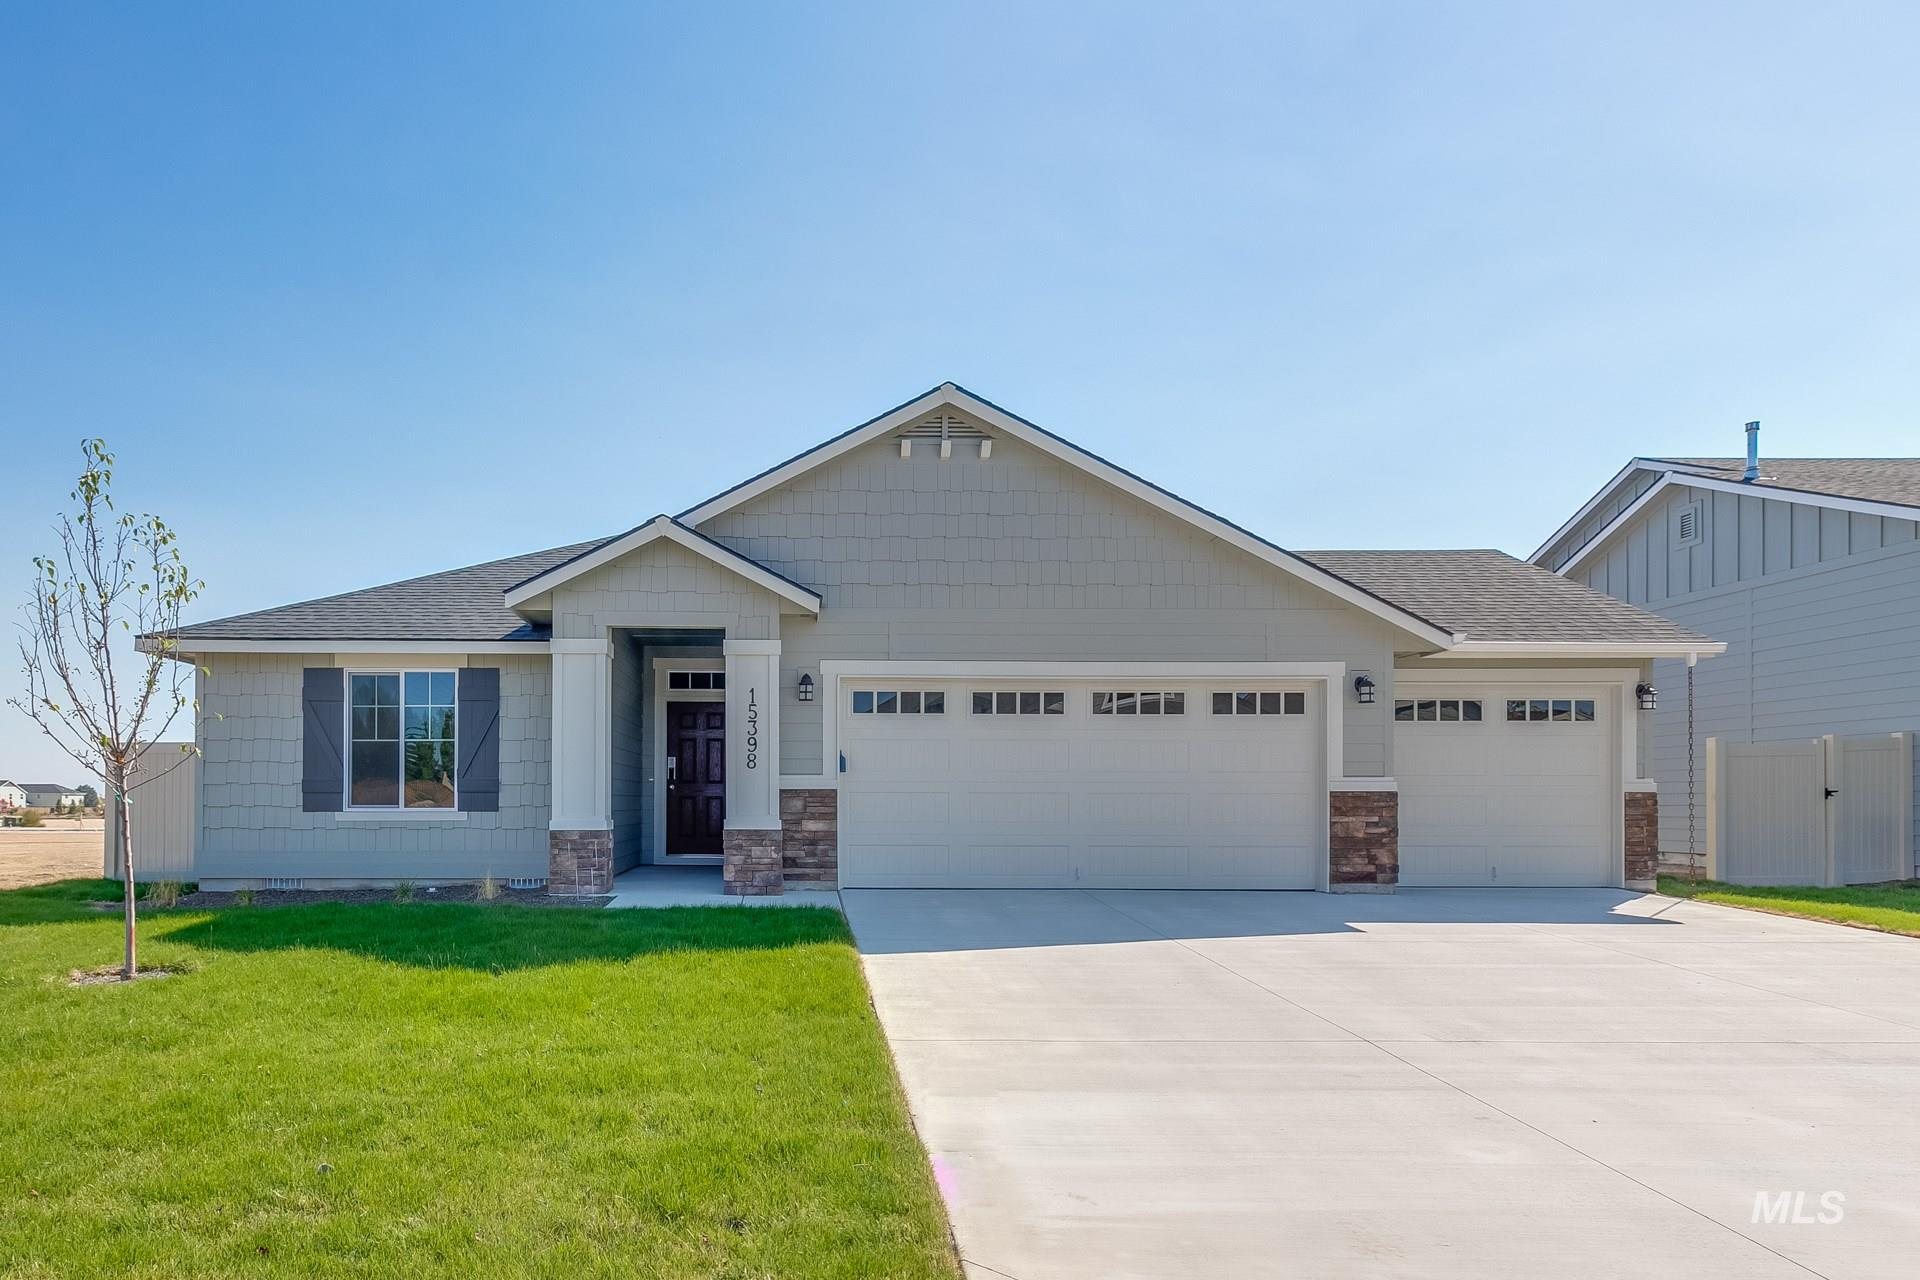 15421 Hogback Way Property Photo - Caldwell, ID real estate listing